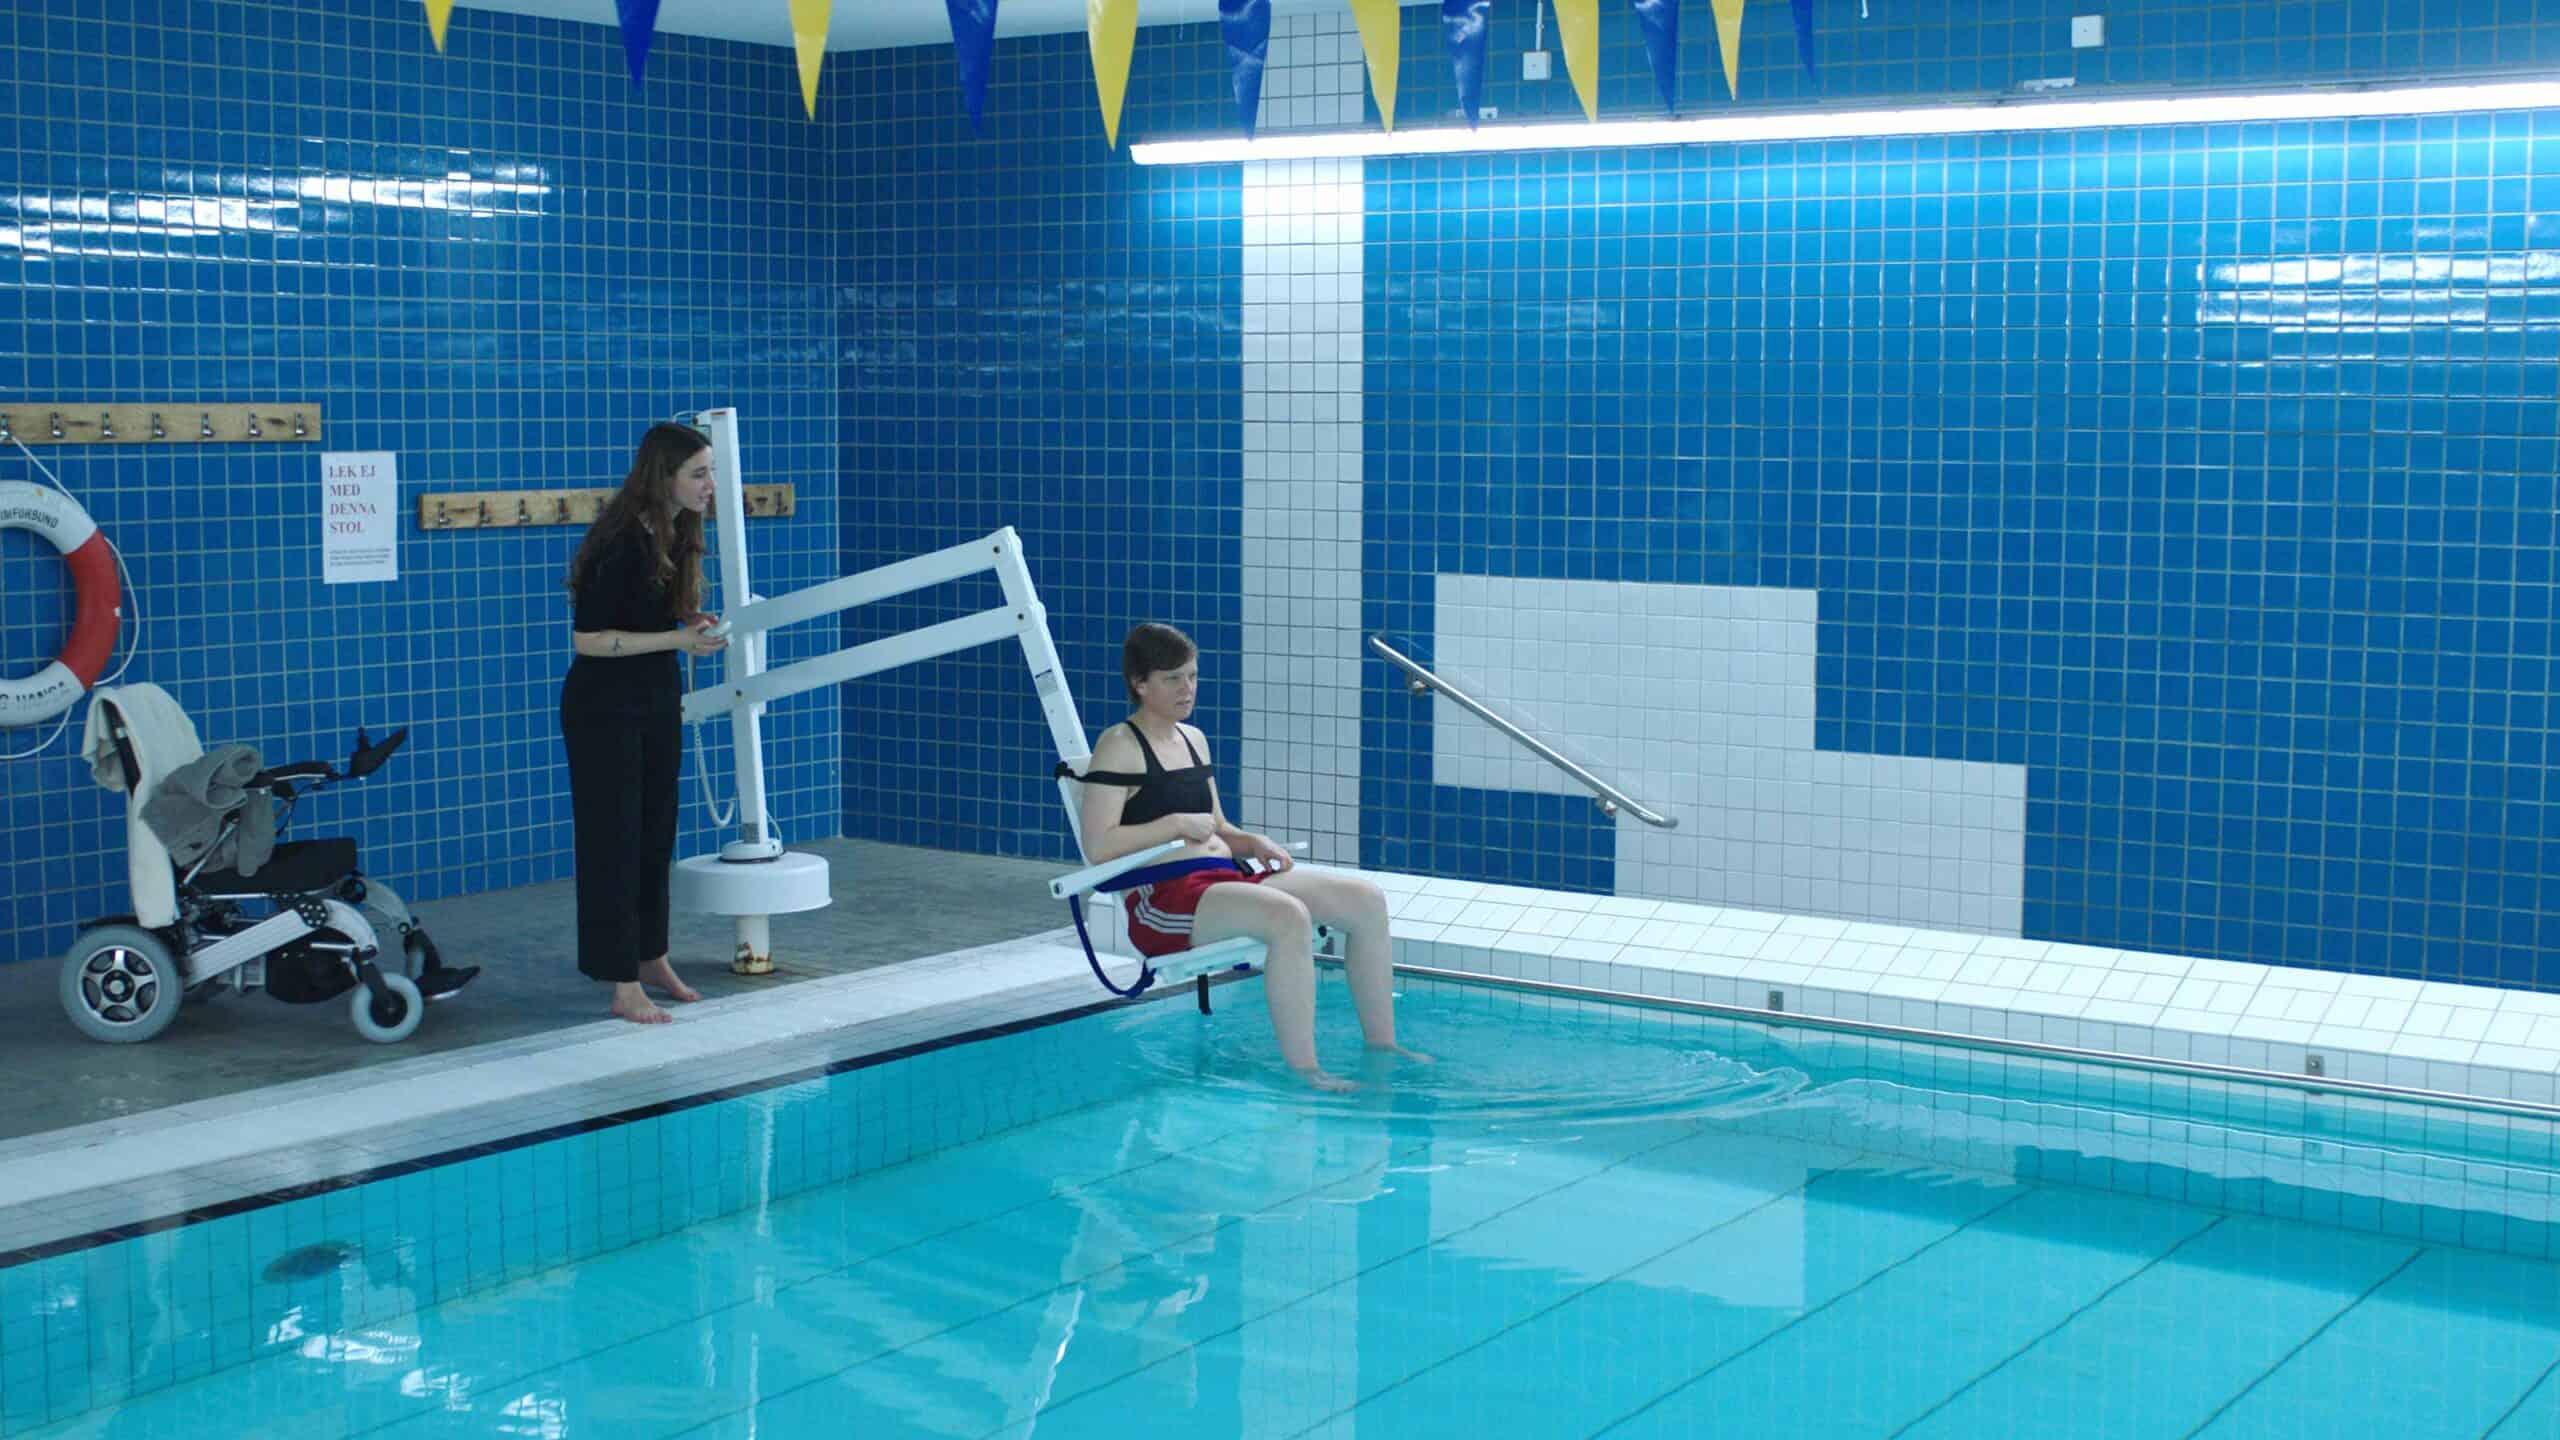 Alive (2020) starring Eva Johansson and Madeleine Martin